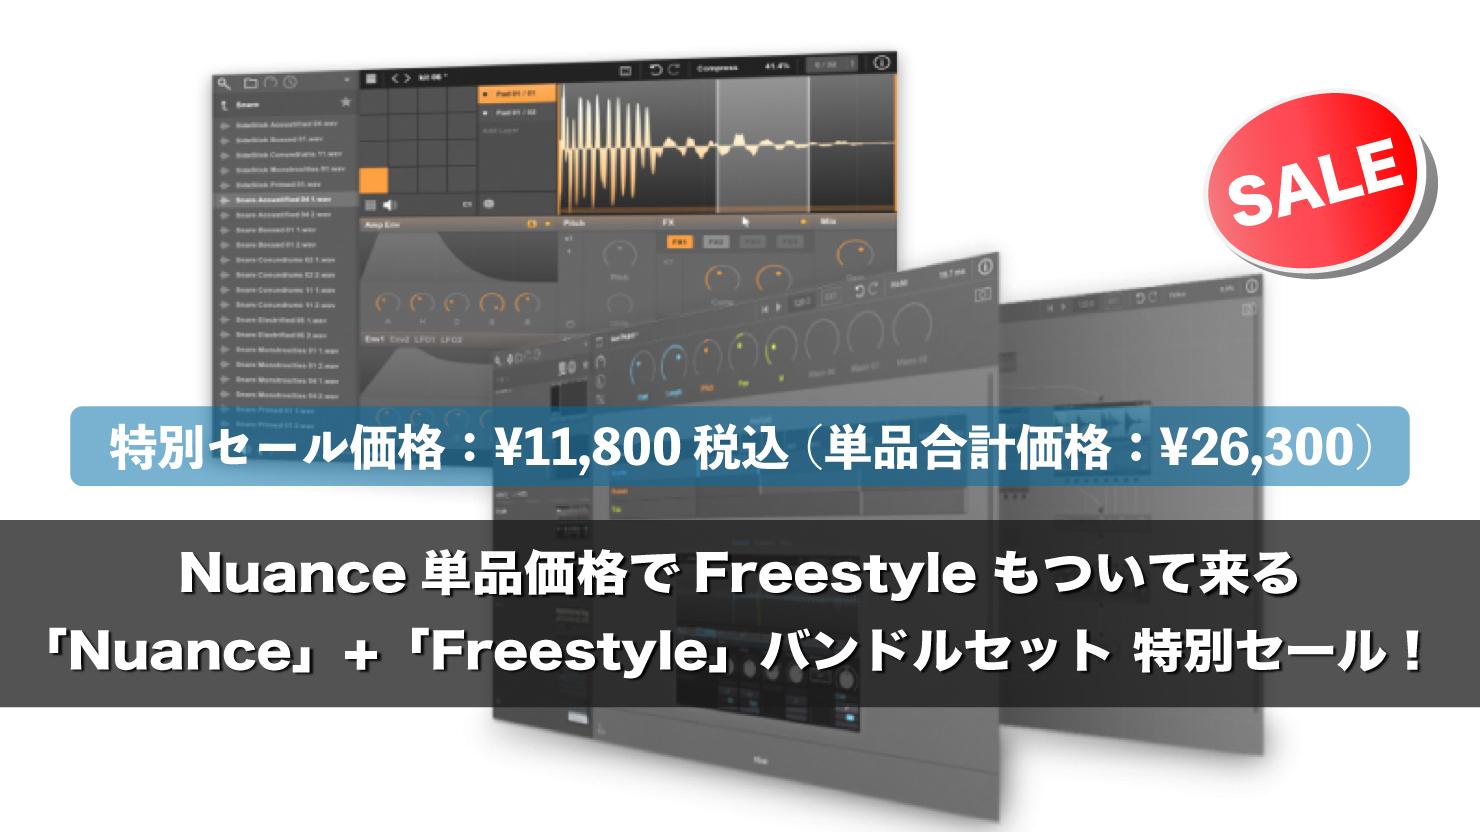 「Nuance」+「Freestyle」特別セール!Nuance単品価格でFreestyleもついて来る